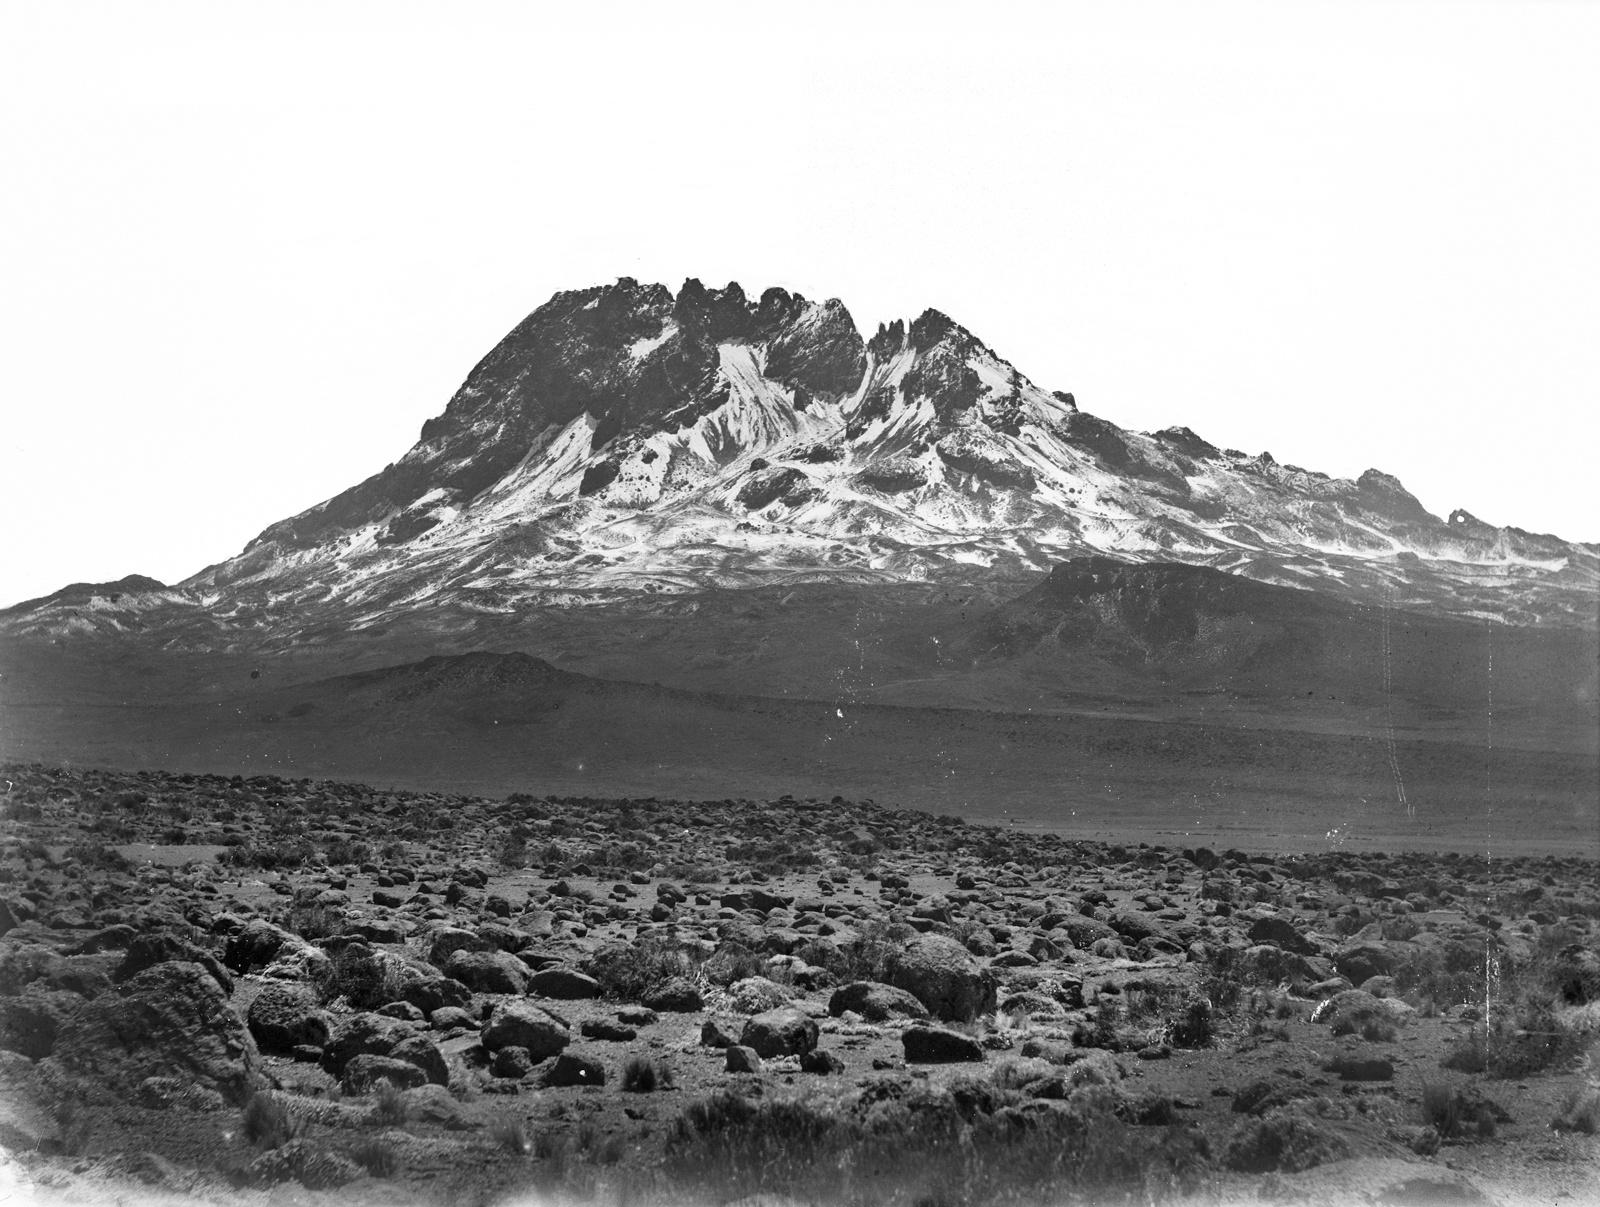 392. Мавенси (5149 м) со свежим снегом. Вид из лагеря на Кибо (4300 м)